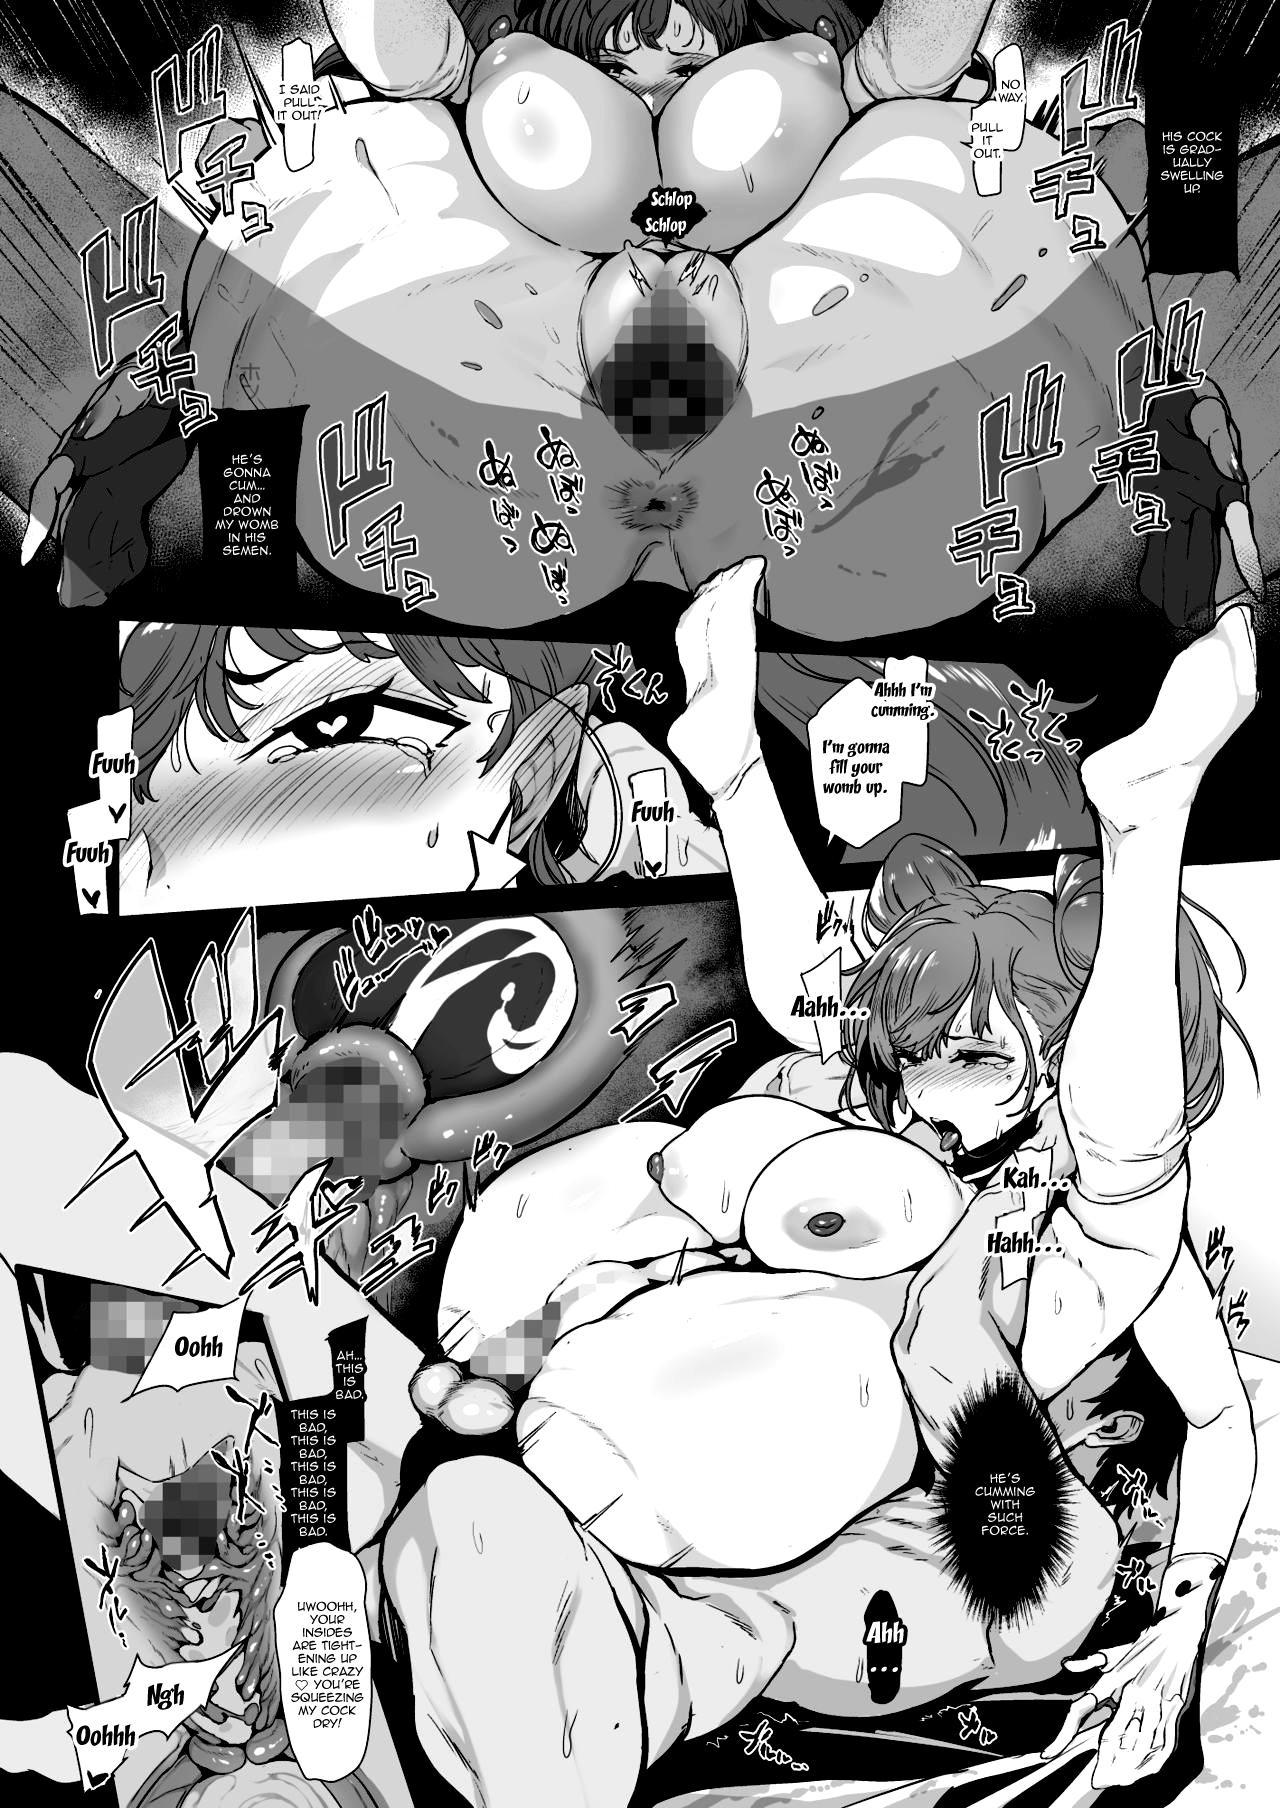 Osabori Musume Atlanta Wakarase Misshitsu Yasei Enshuu | I Found Out That The Truant Girl Atlanta Was Practicing Sex In A Locked Room At Night 20